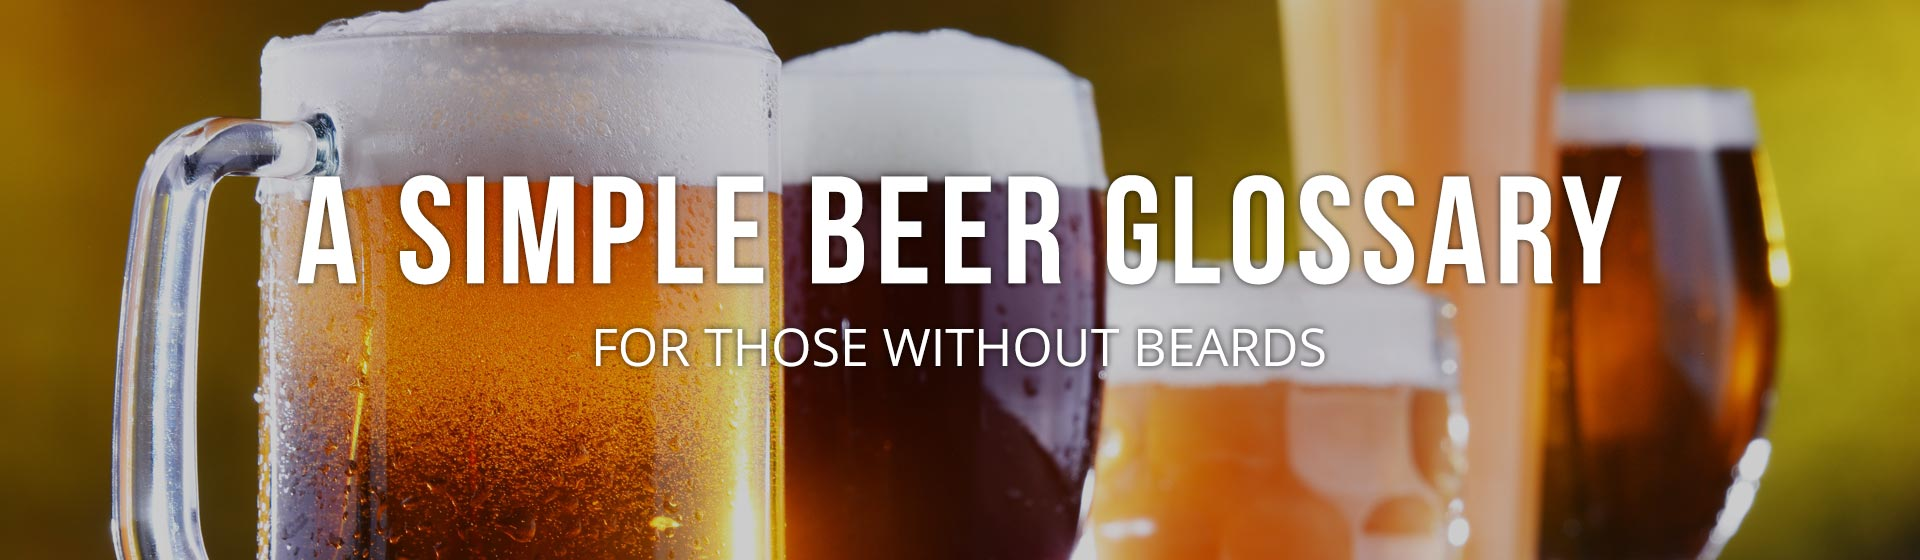 Beer Glossary